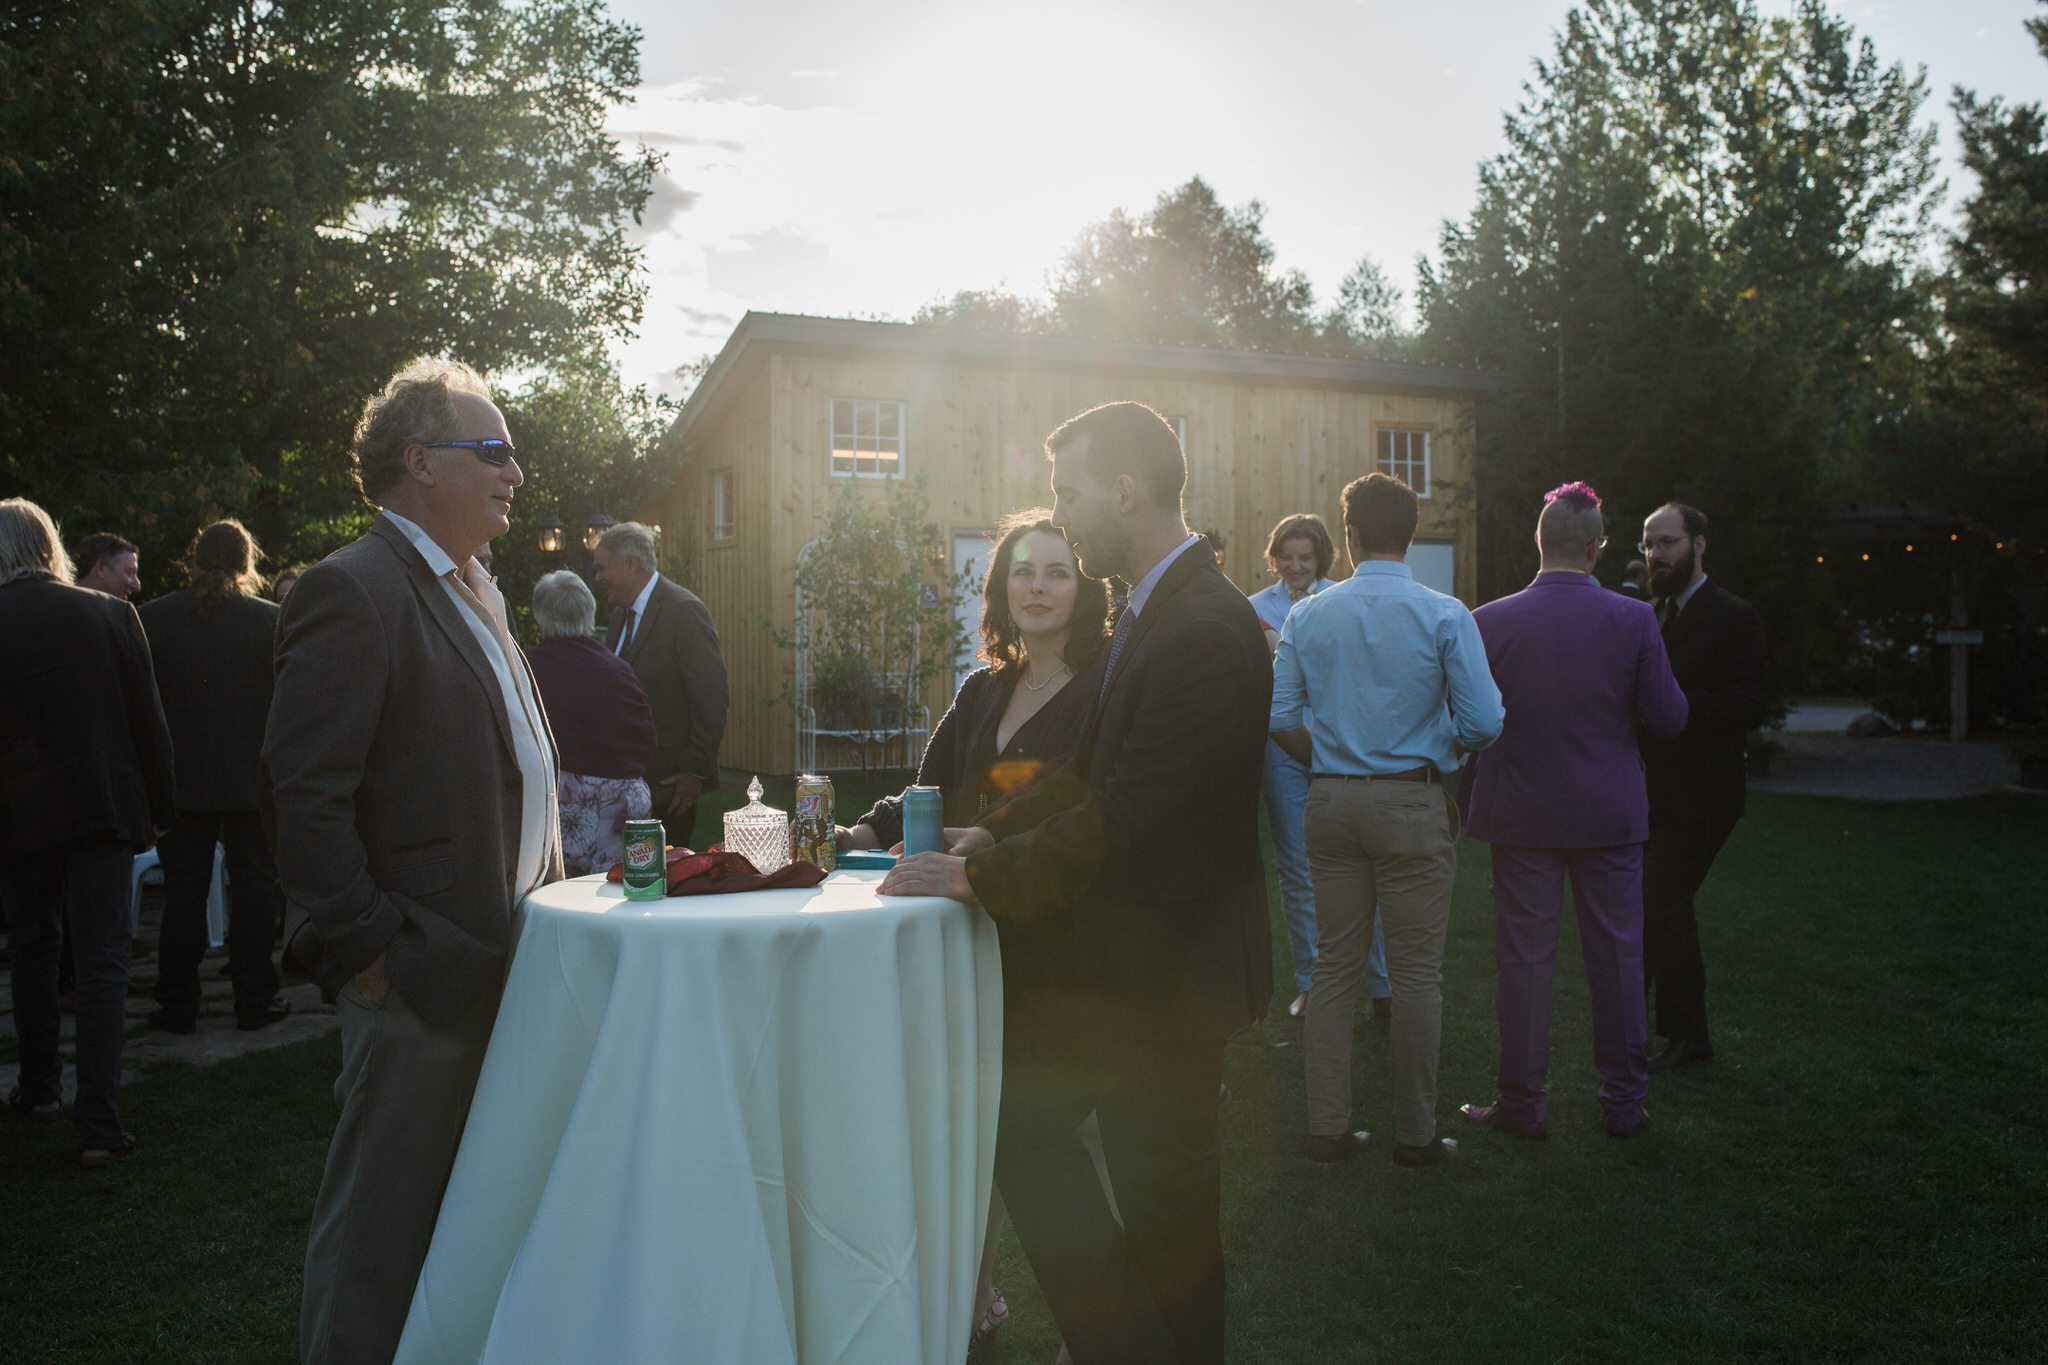 Northview Gardens Wedding - reception on the lawn